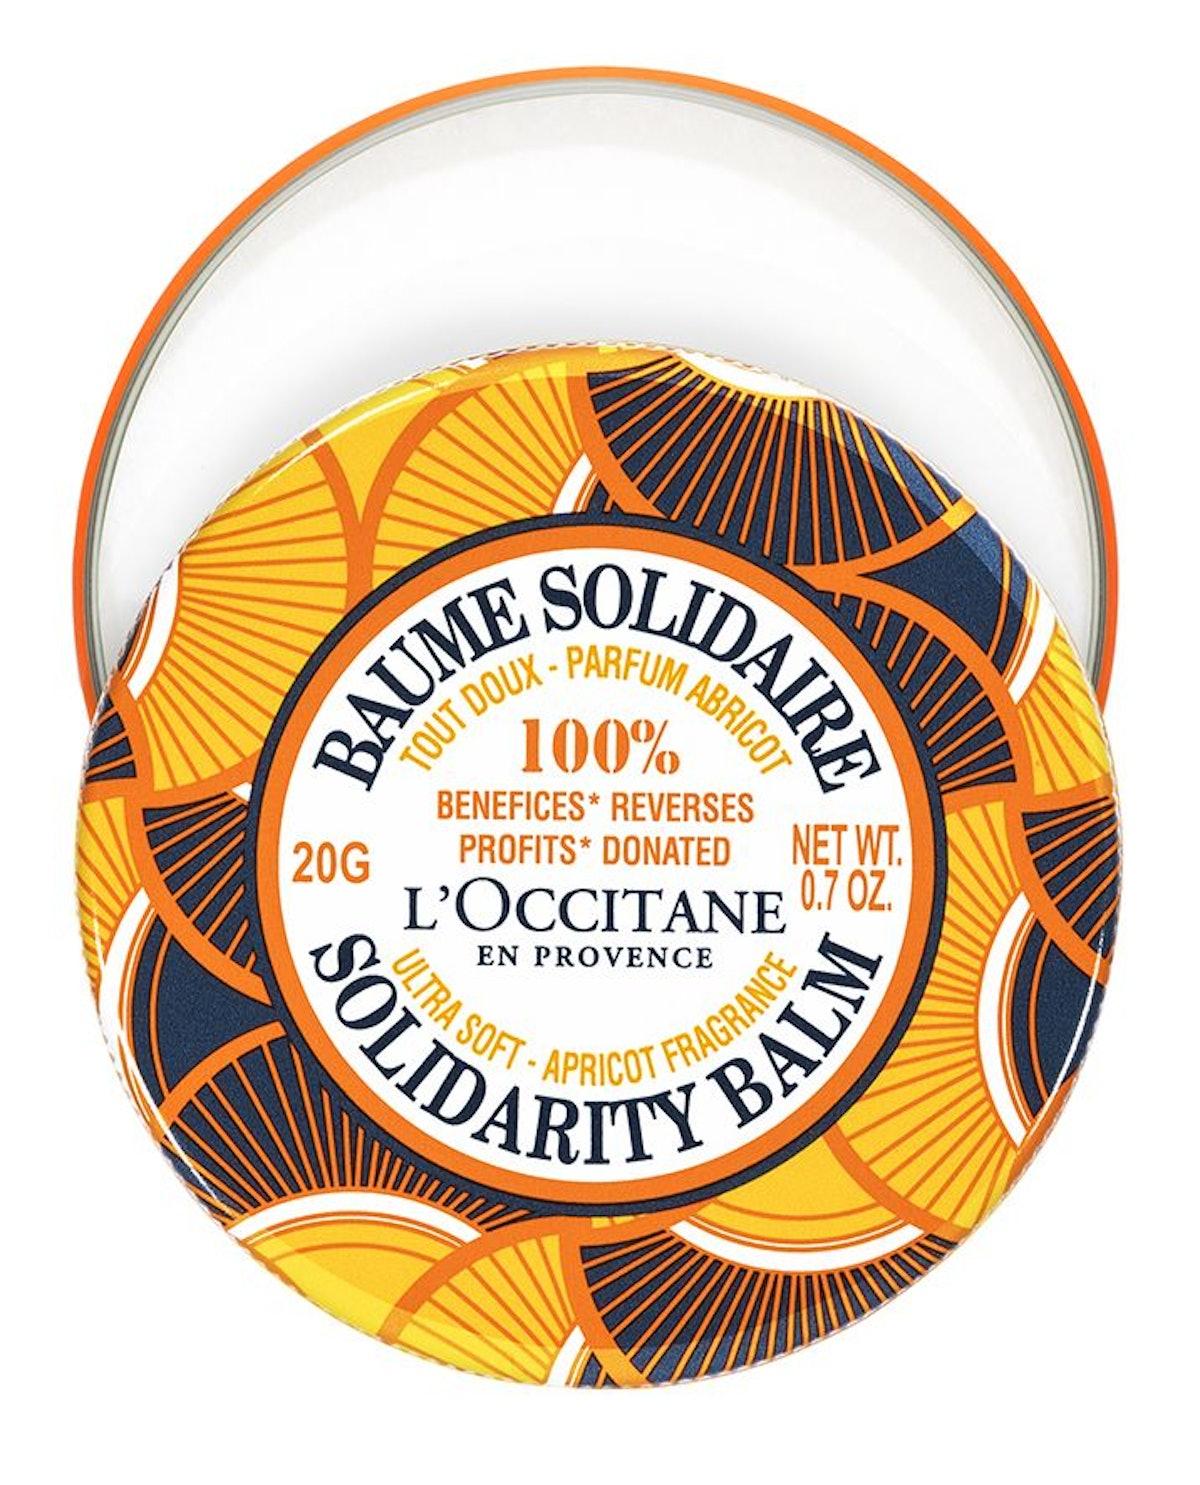 Apricot Fragrance Ultra Soft Solidarity Balm